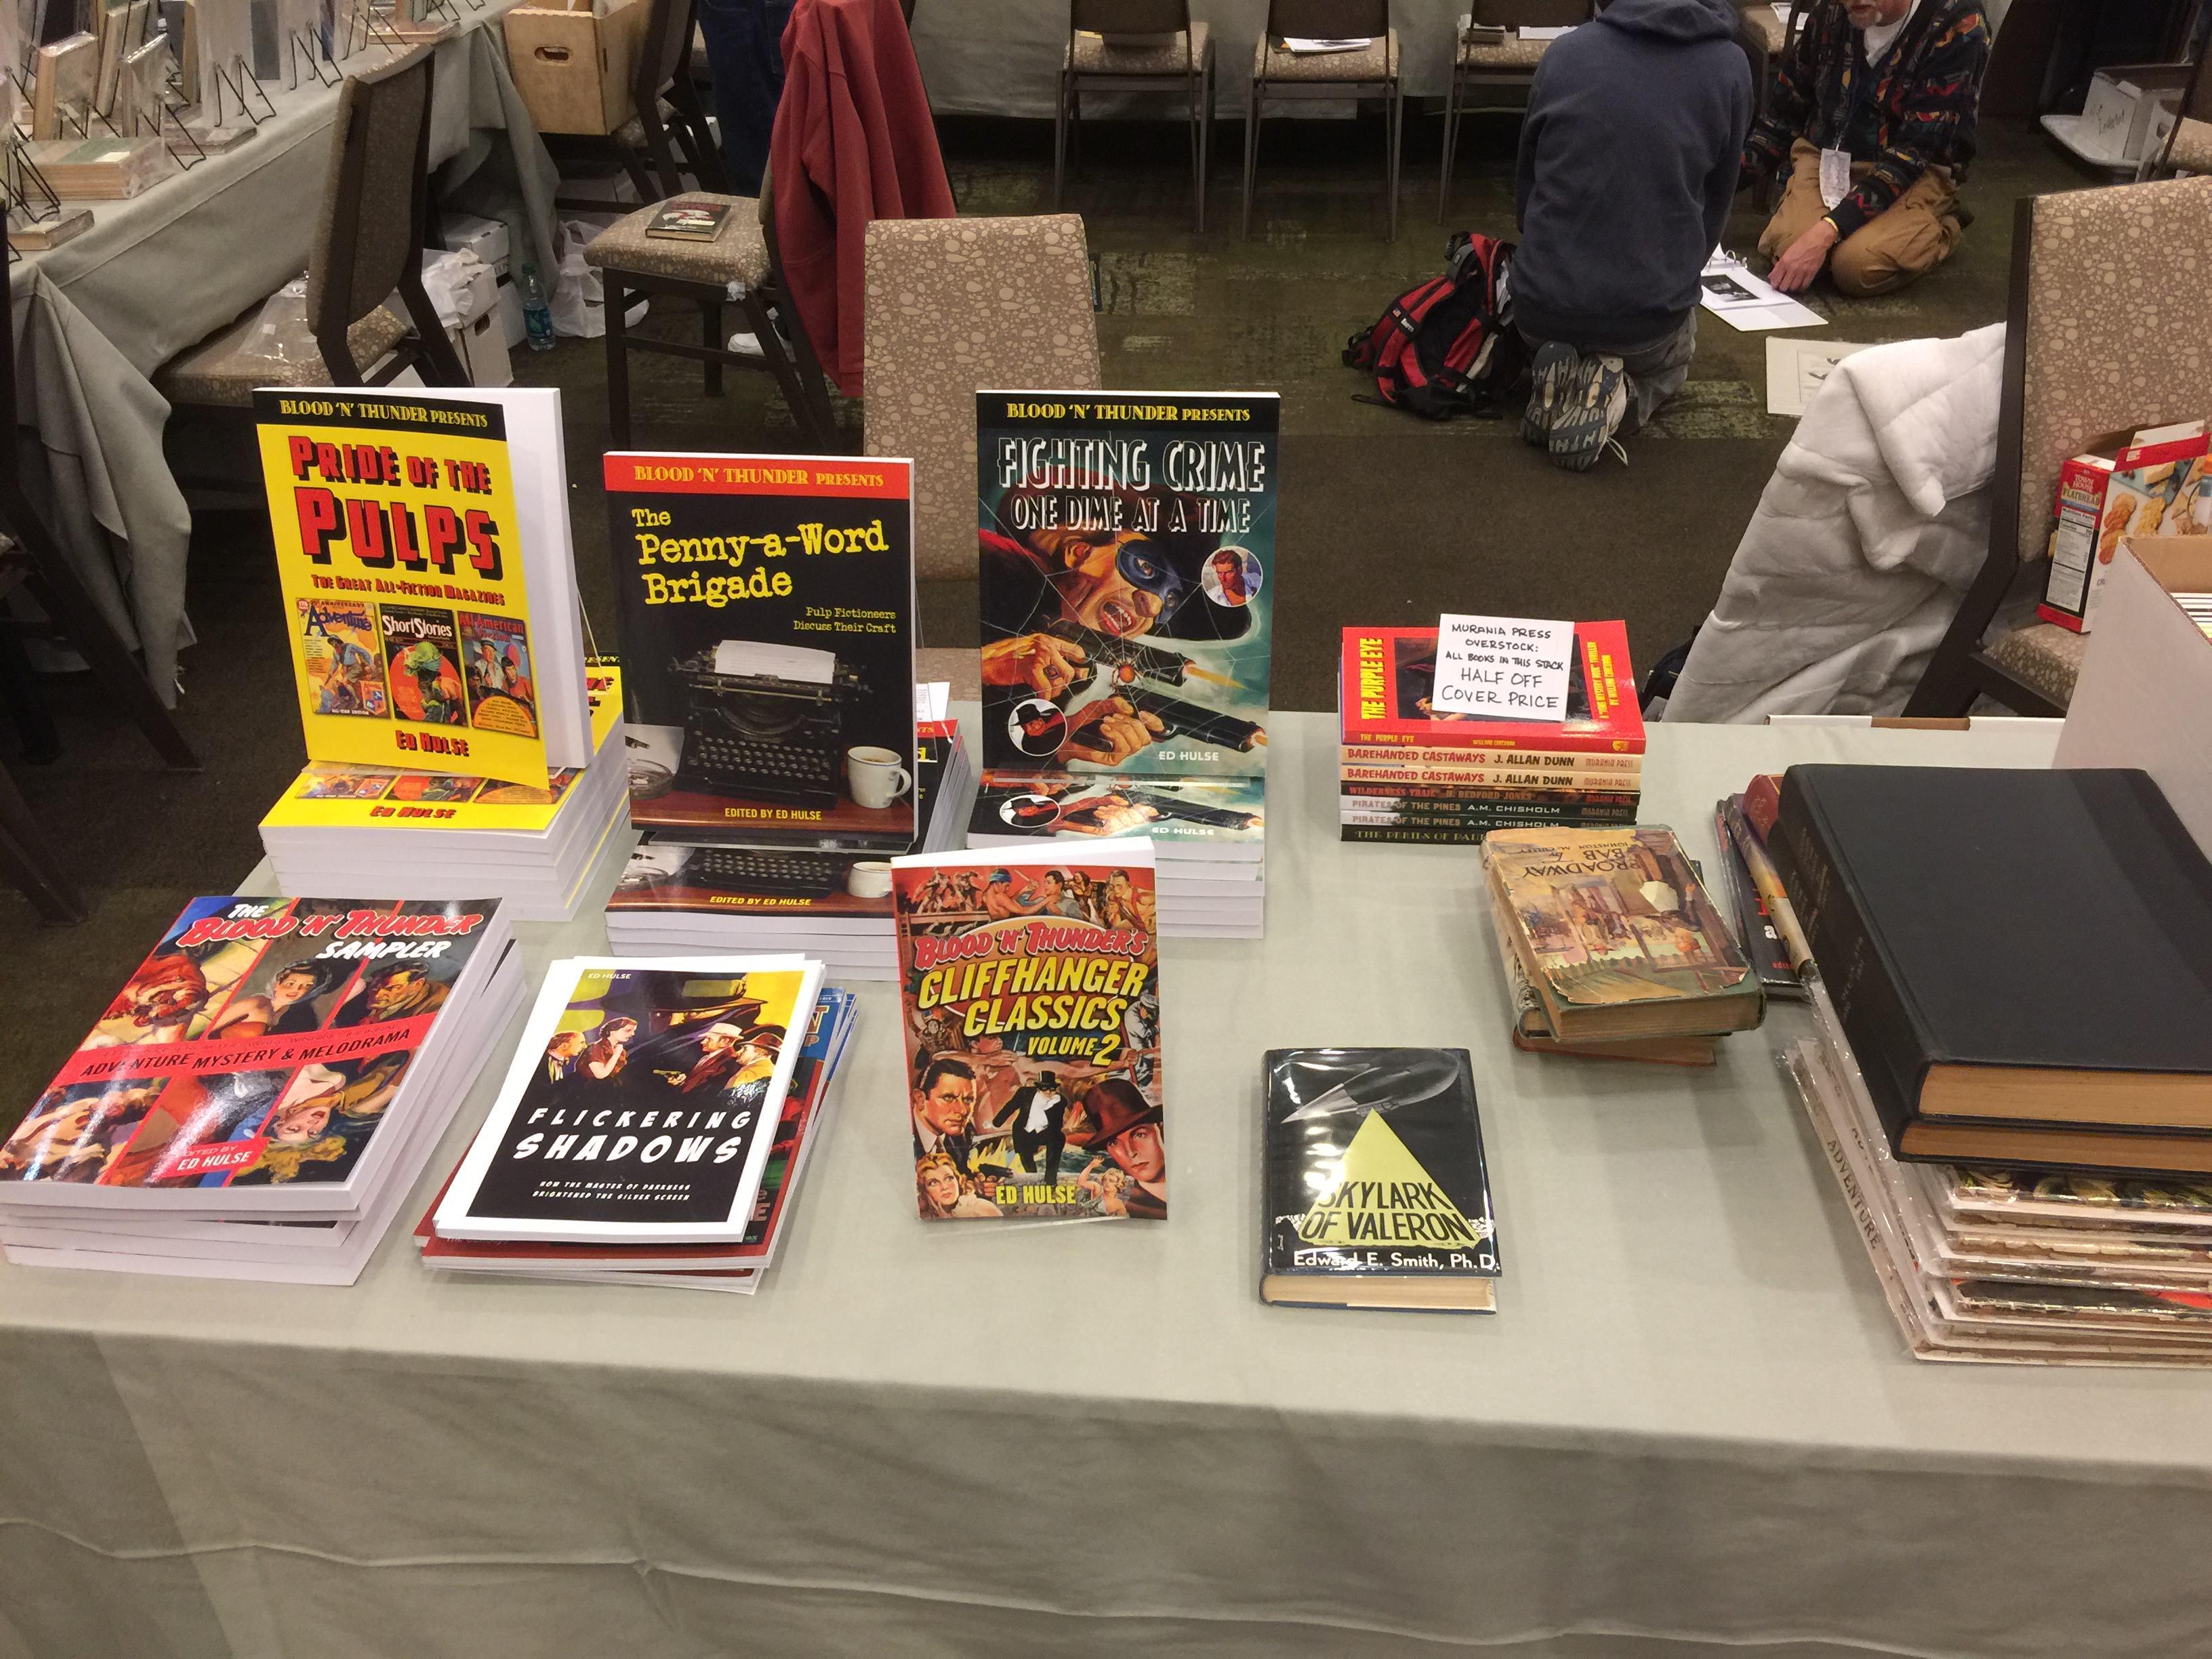 Murania Press had a table